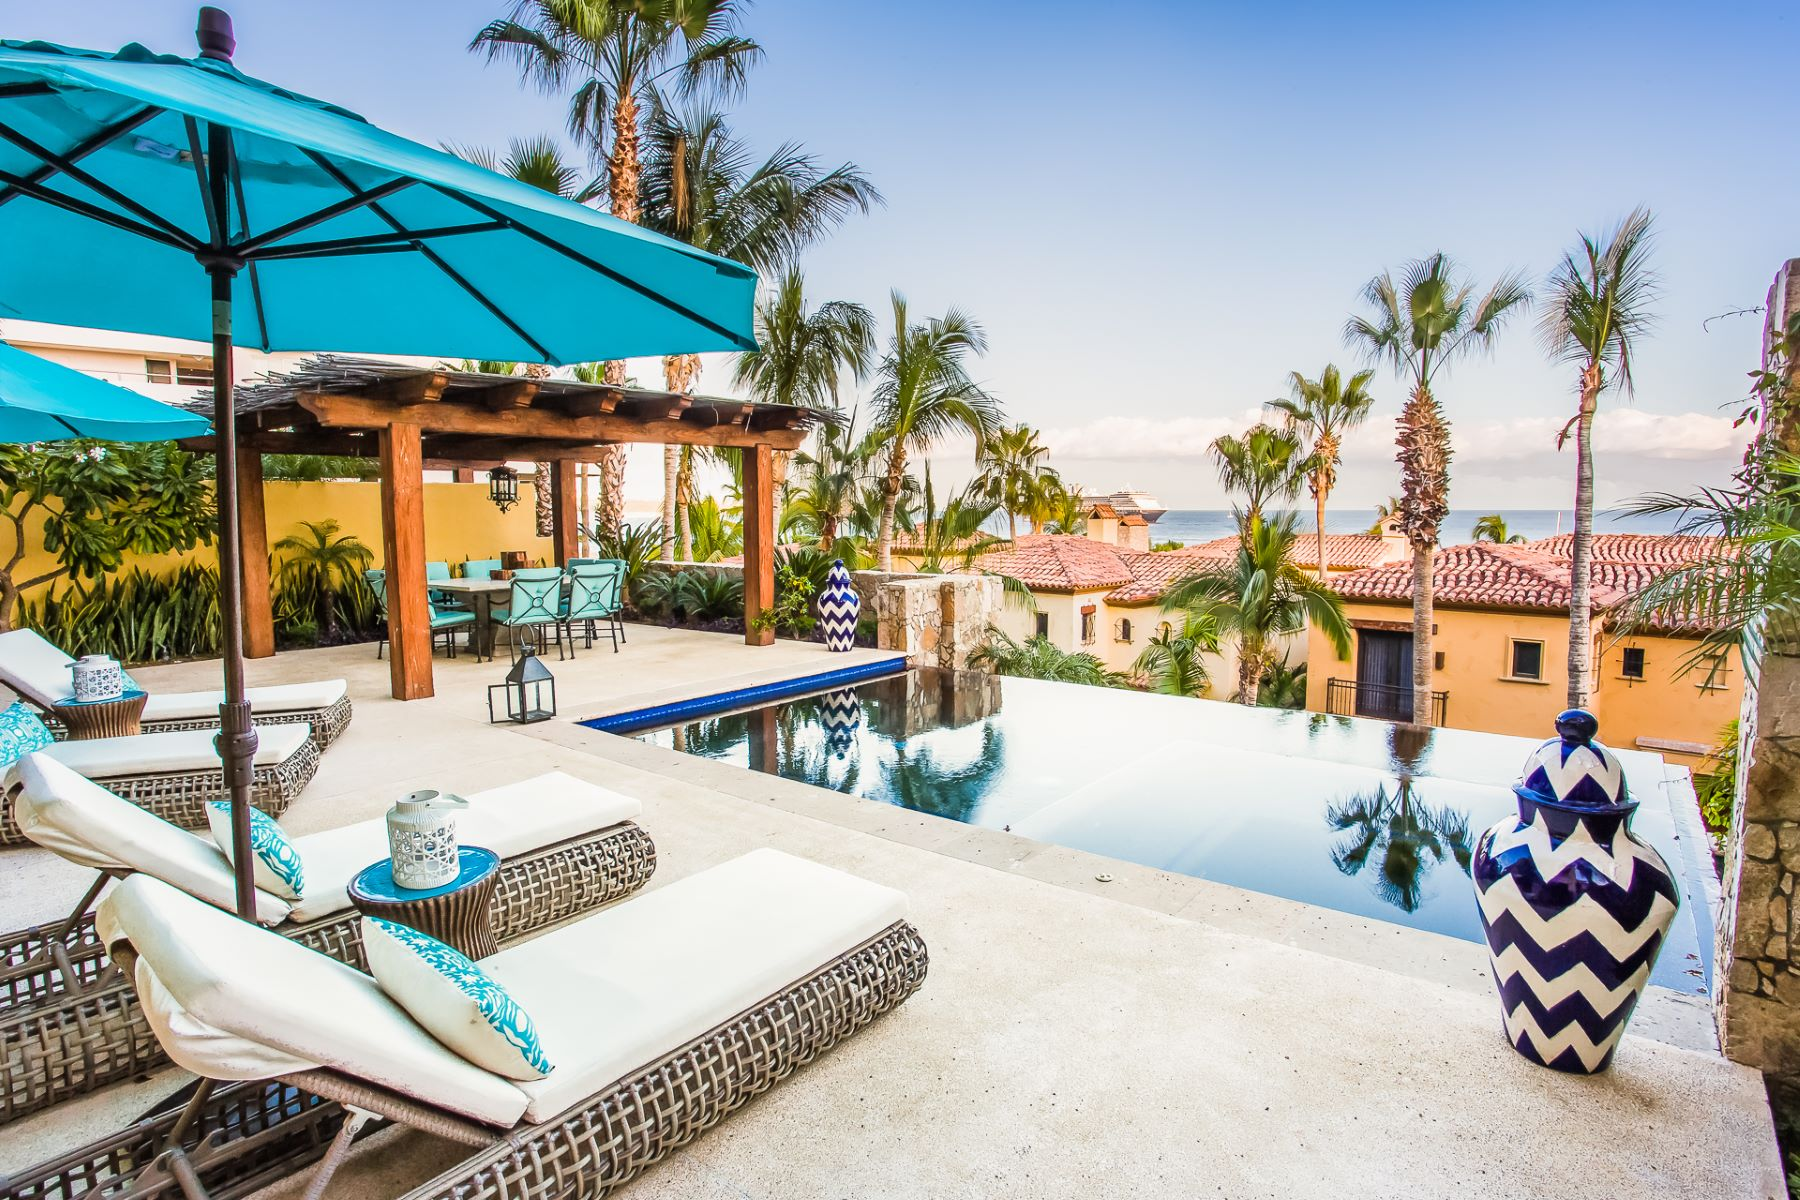 Additional photo for property listing at Veranda del Aqua Cabo San Lucas, Baja California Sur Mexico